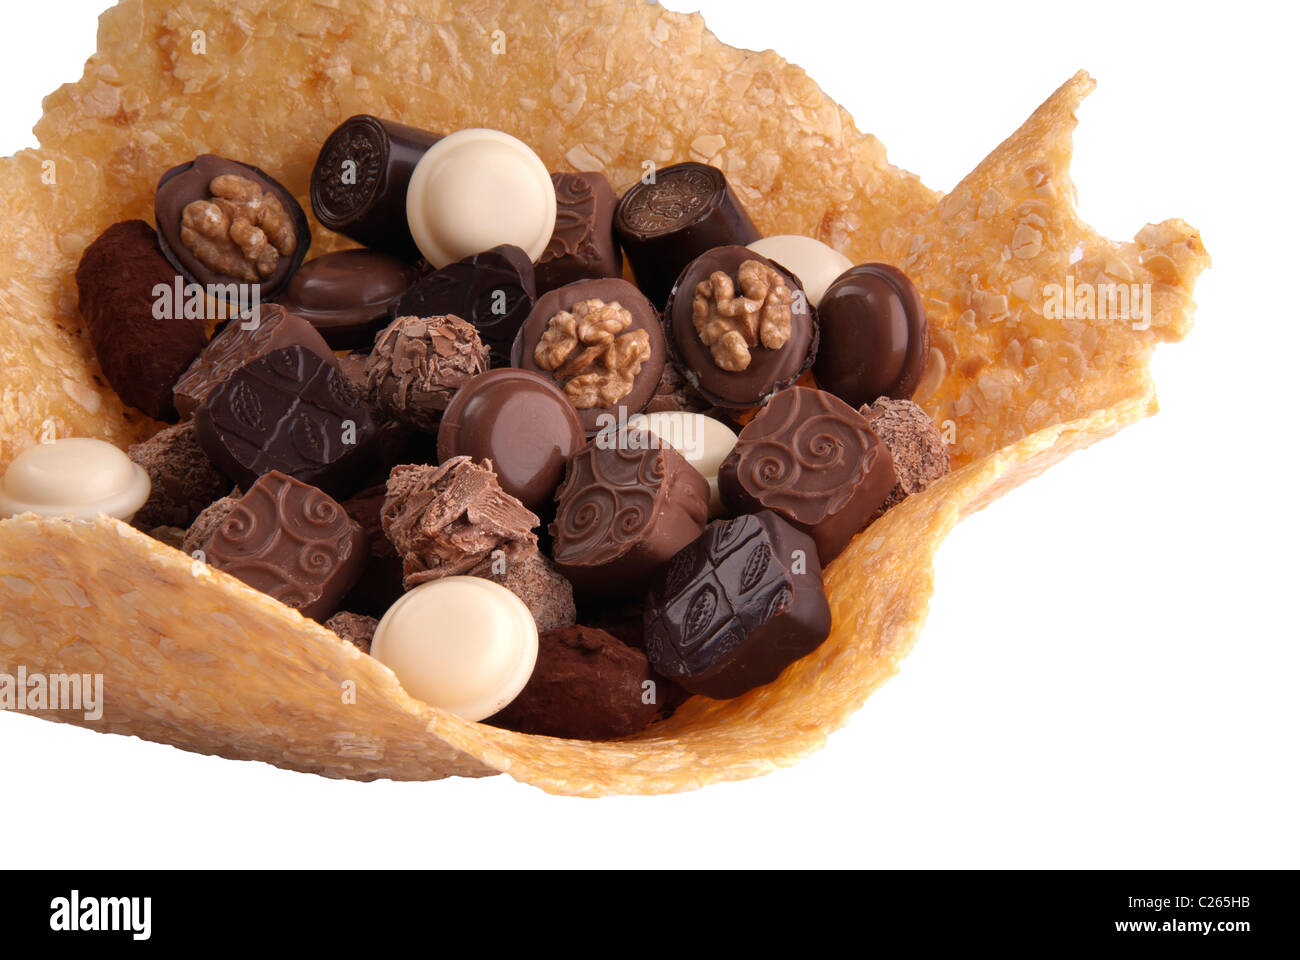 chocolate bonbons assorted,caramel - Stock Image